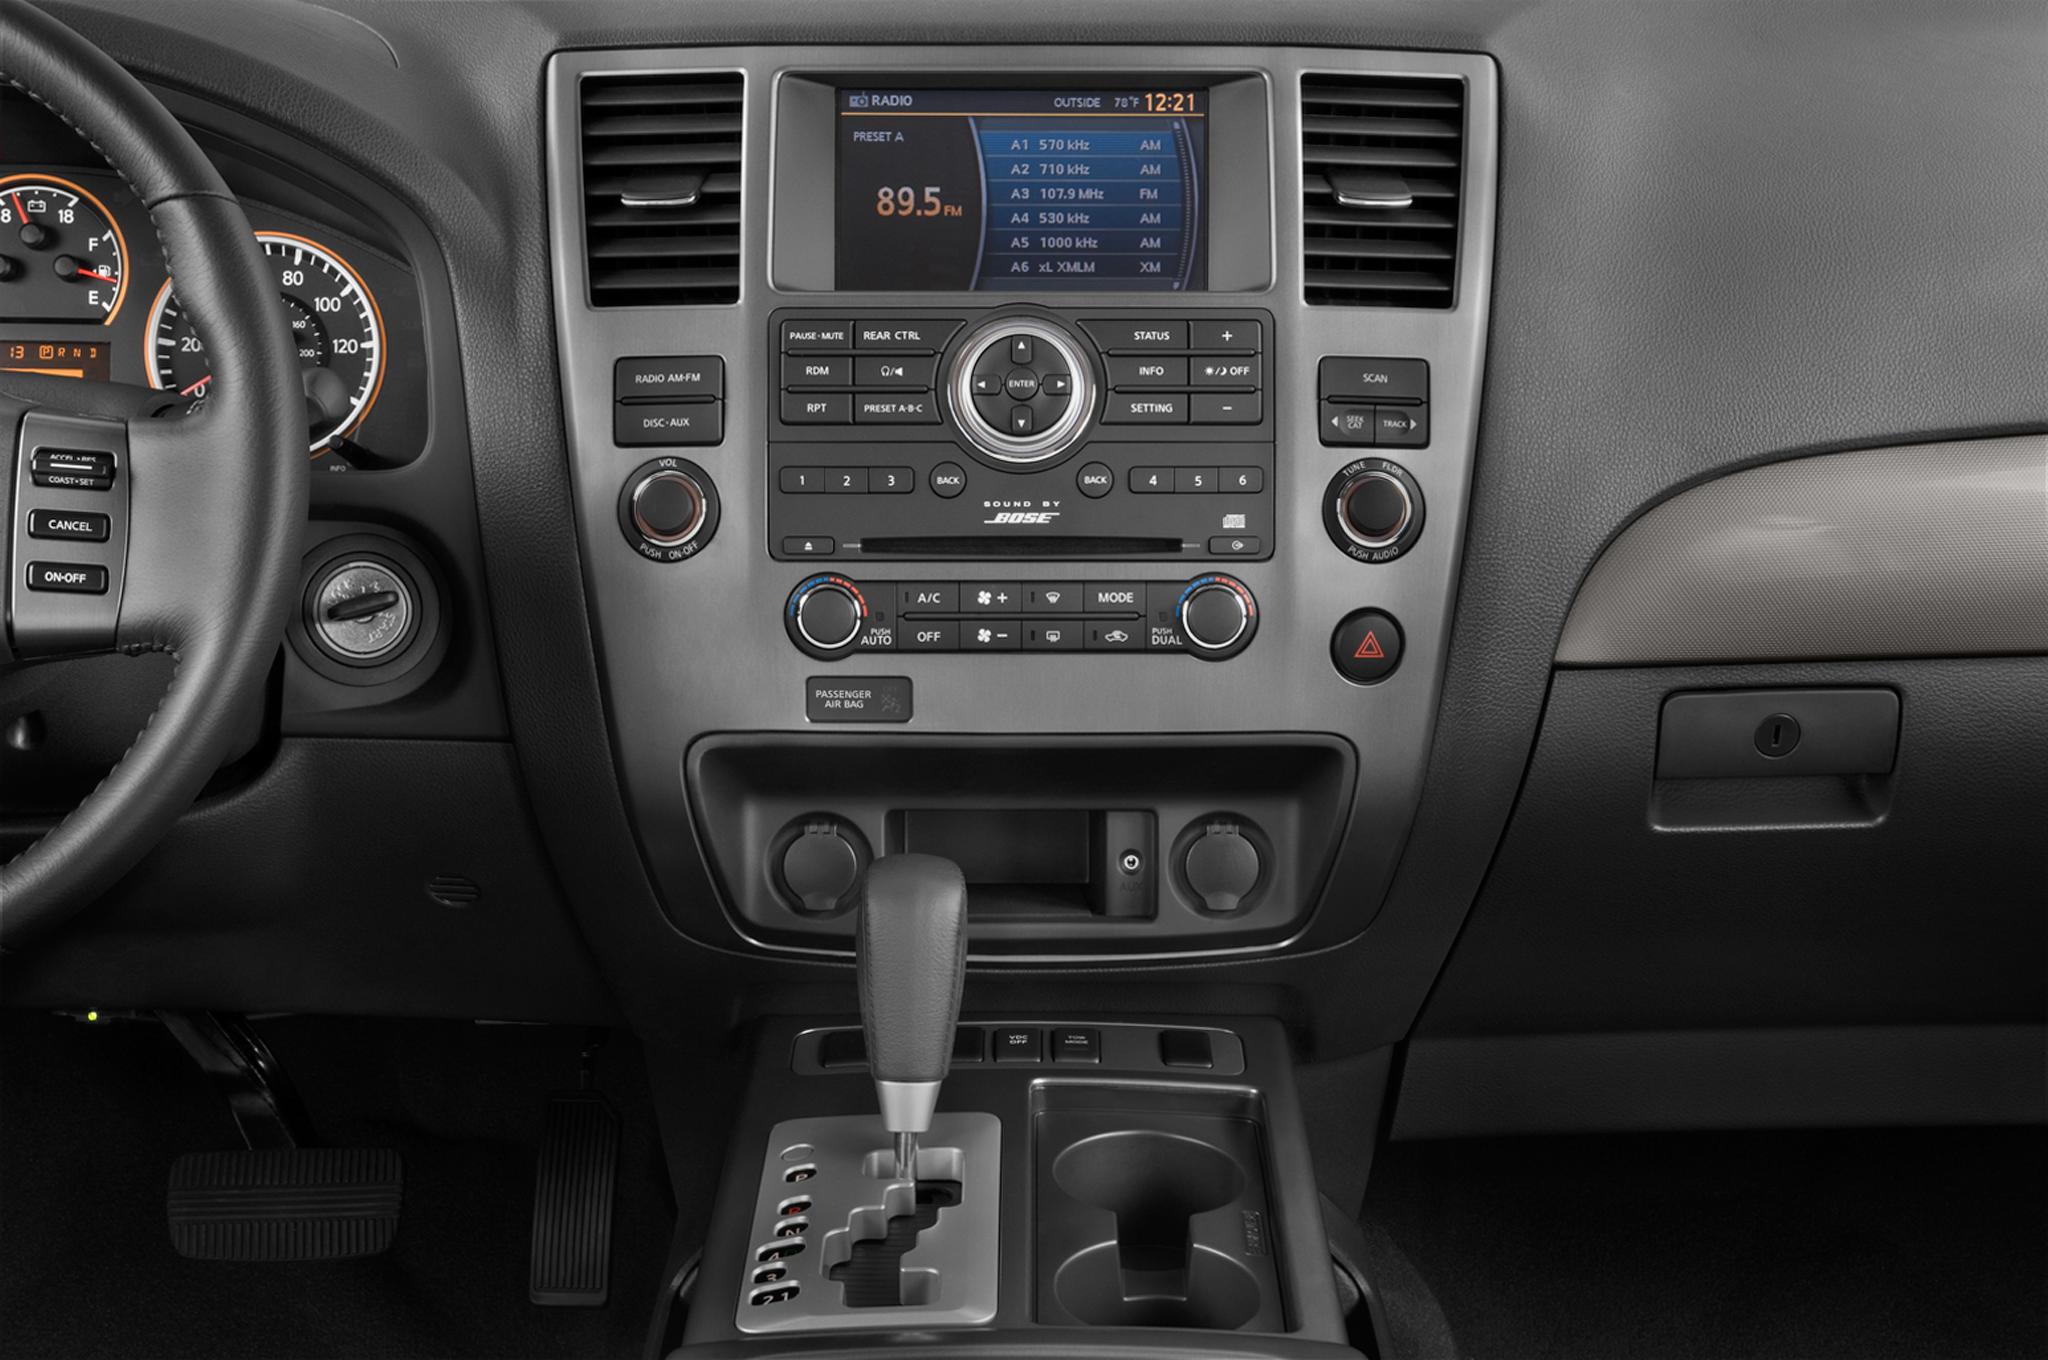 2010 Nissan Armada 2009 Nissan Murano 360 176 Pricing Announced